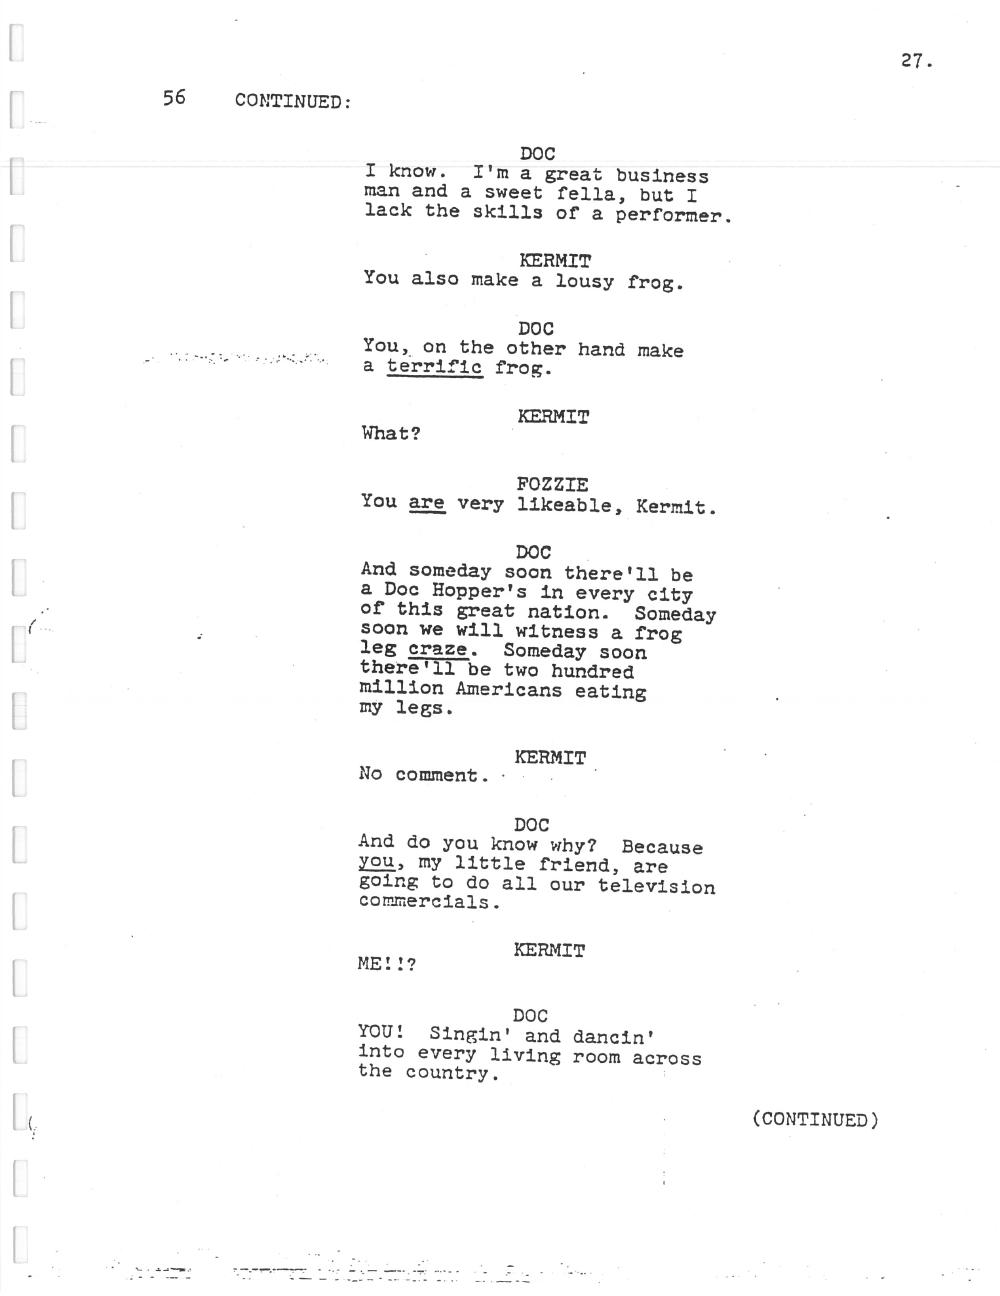 image muppet movie script 027 jpg muppet wiki fandom powered